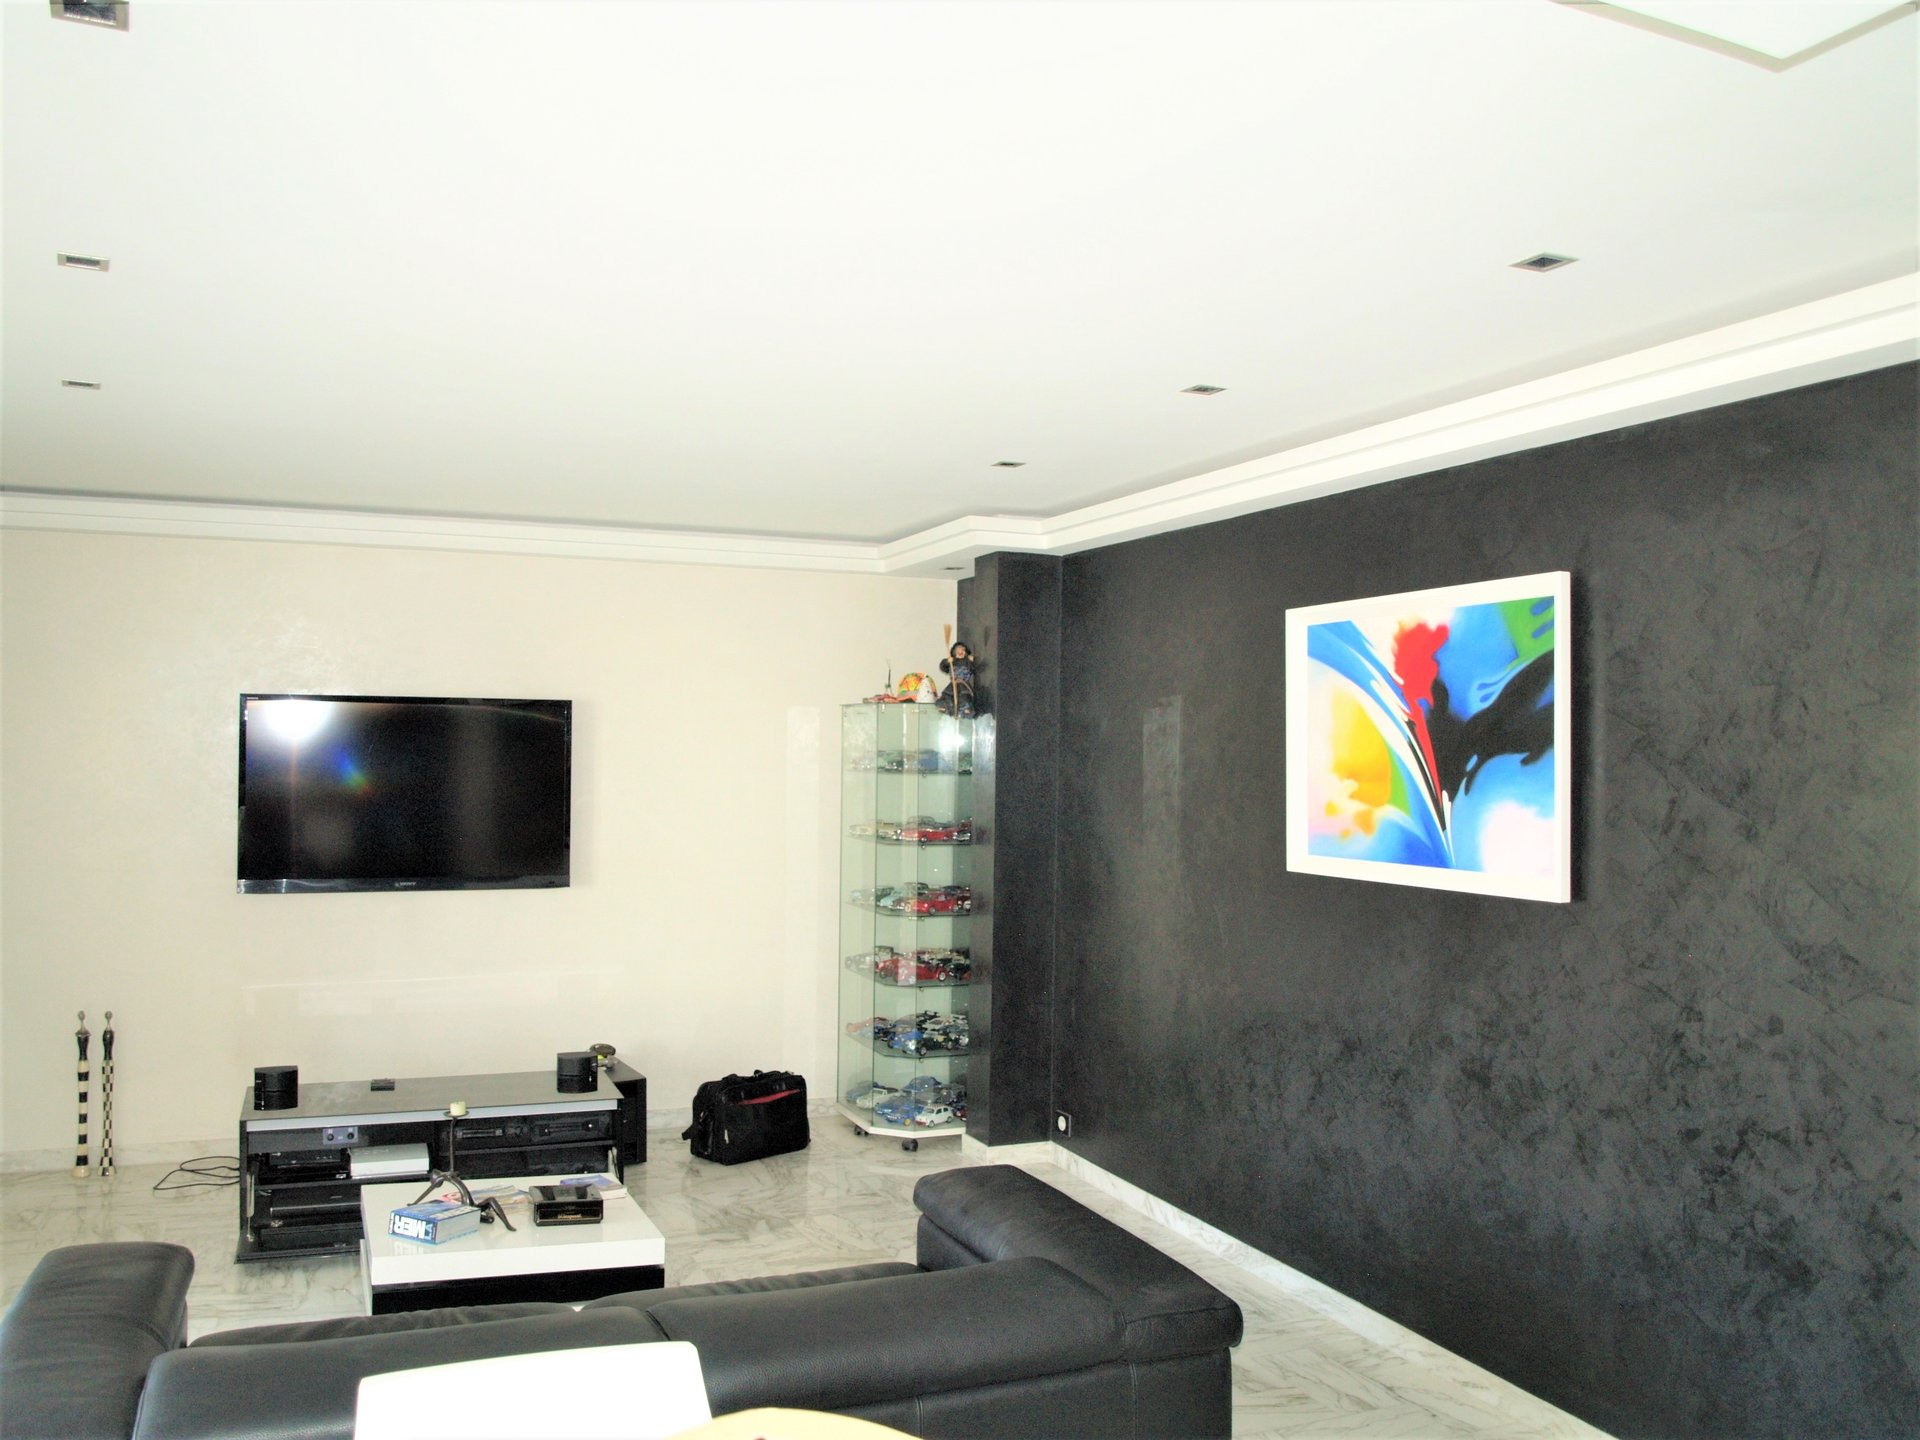 Magnificent 3 Rooms - Le Cannet